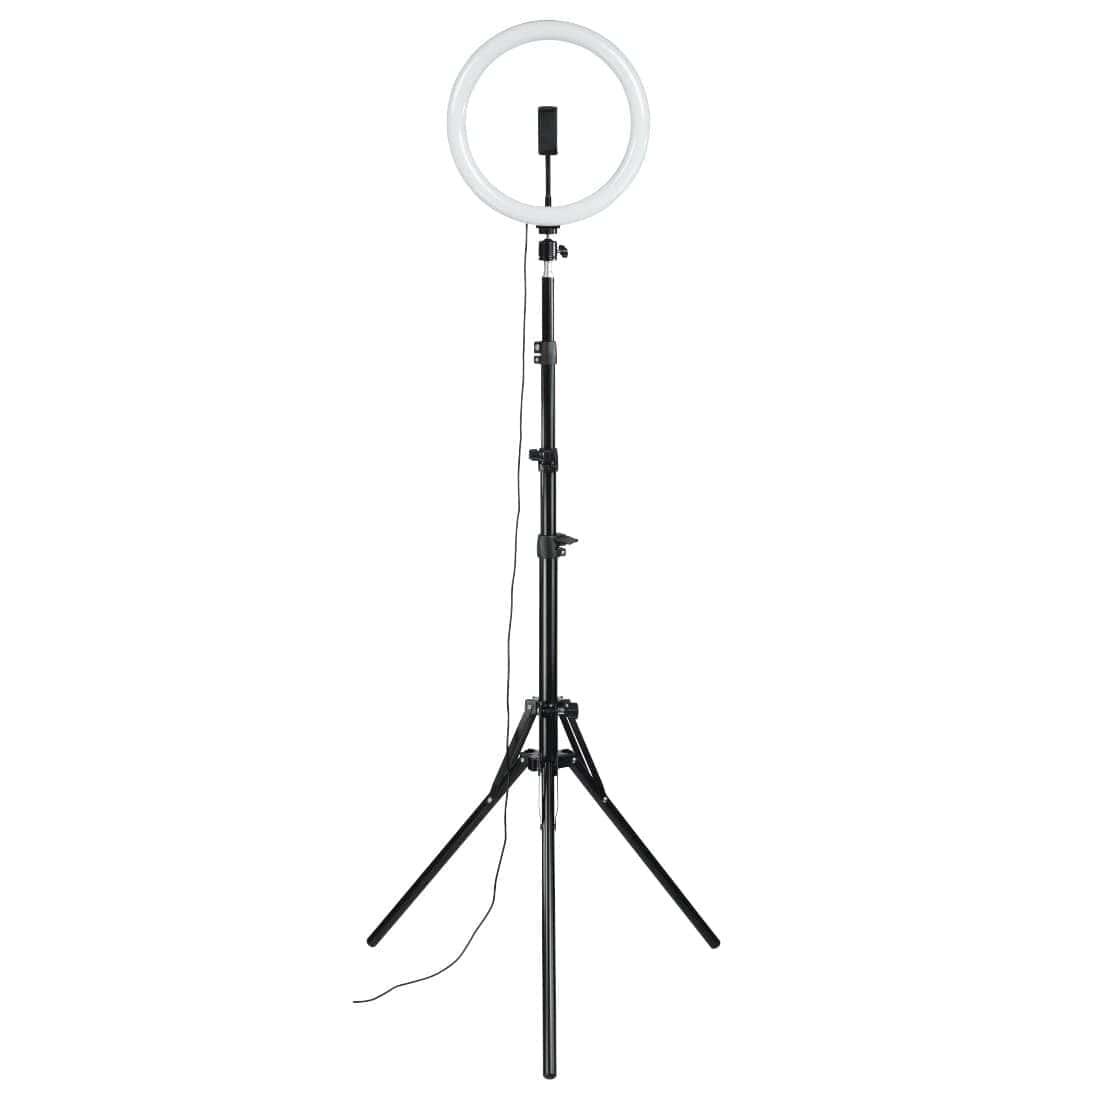 Hama LED Ringlicht SpotLight Stedy 120 Set